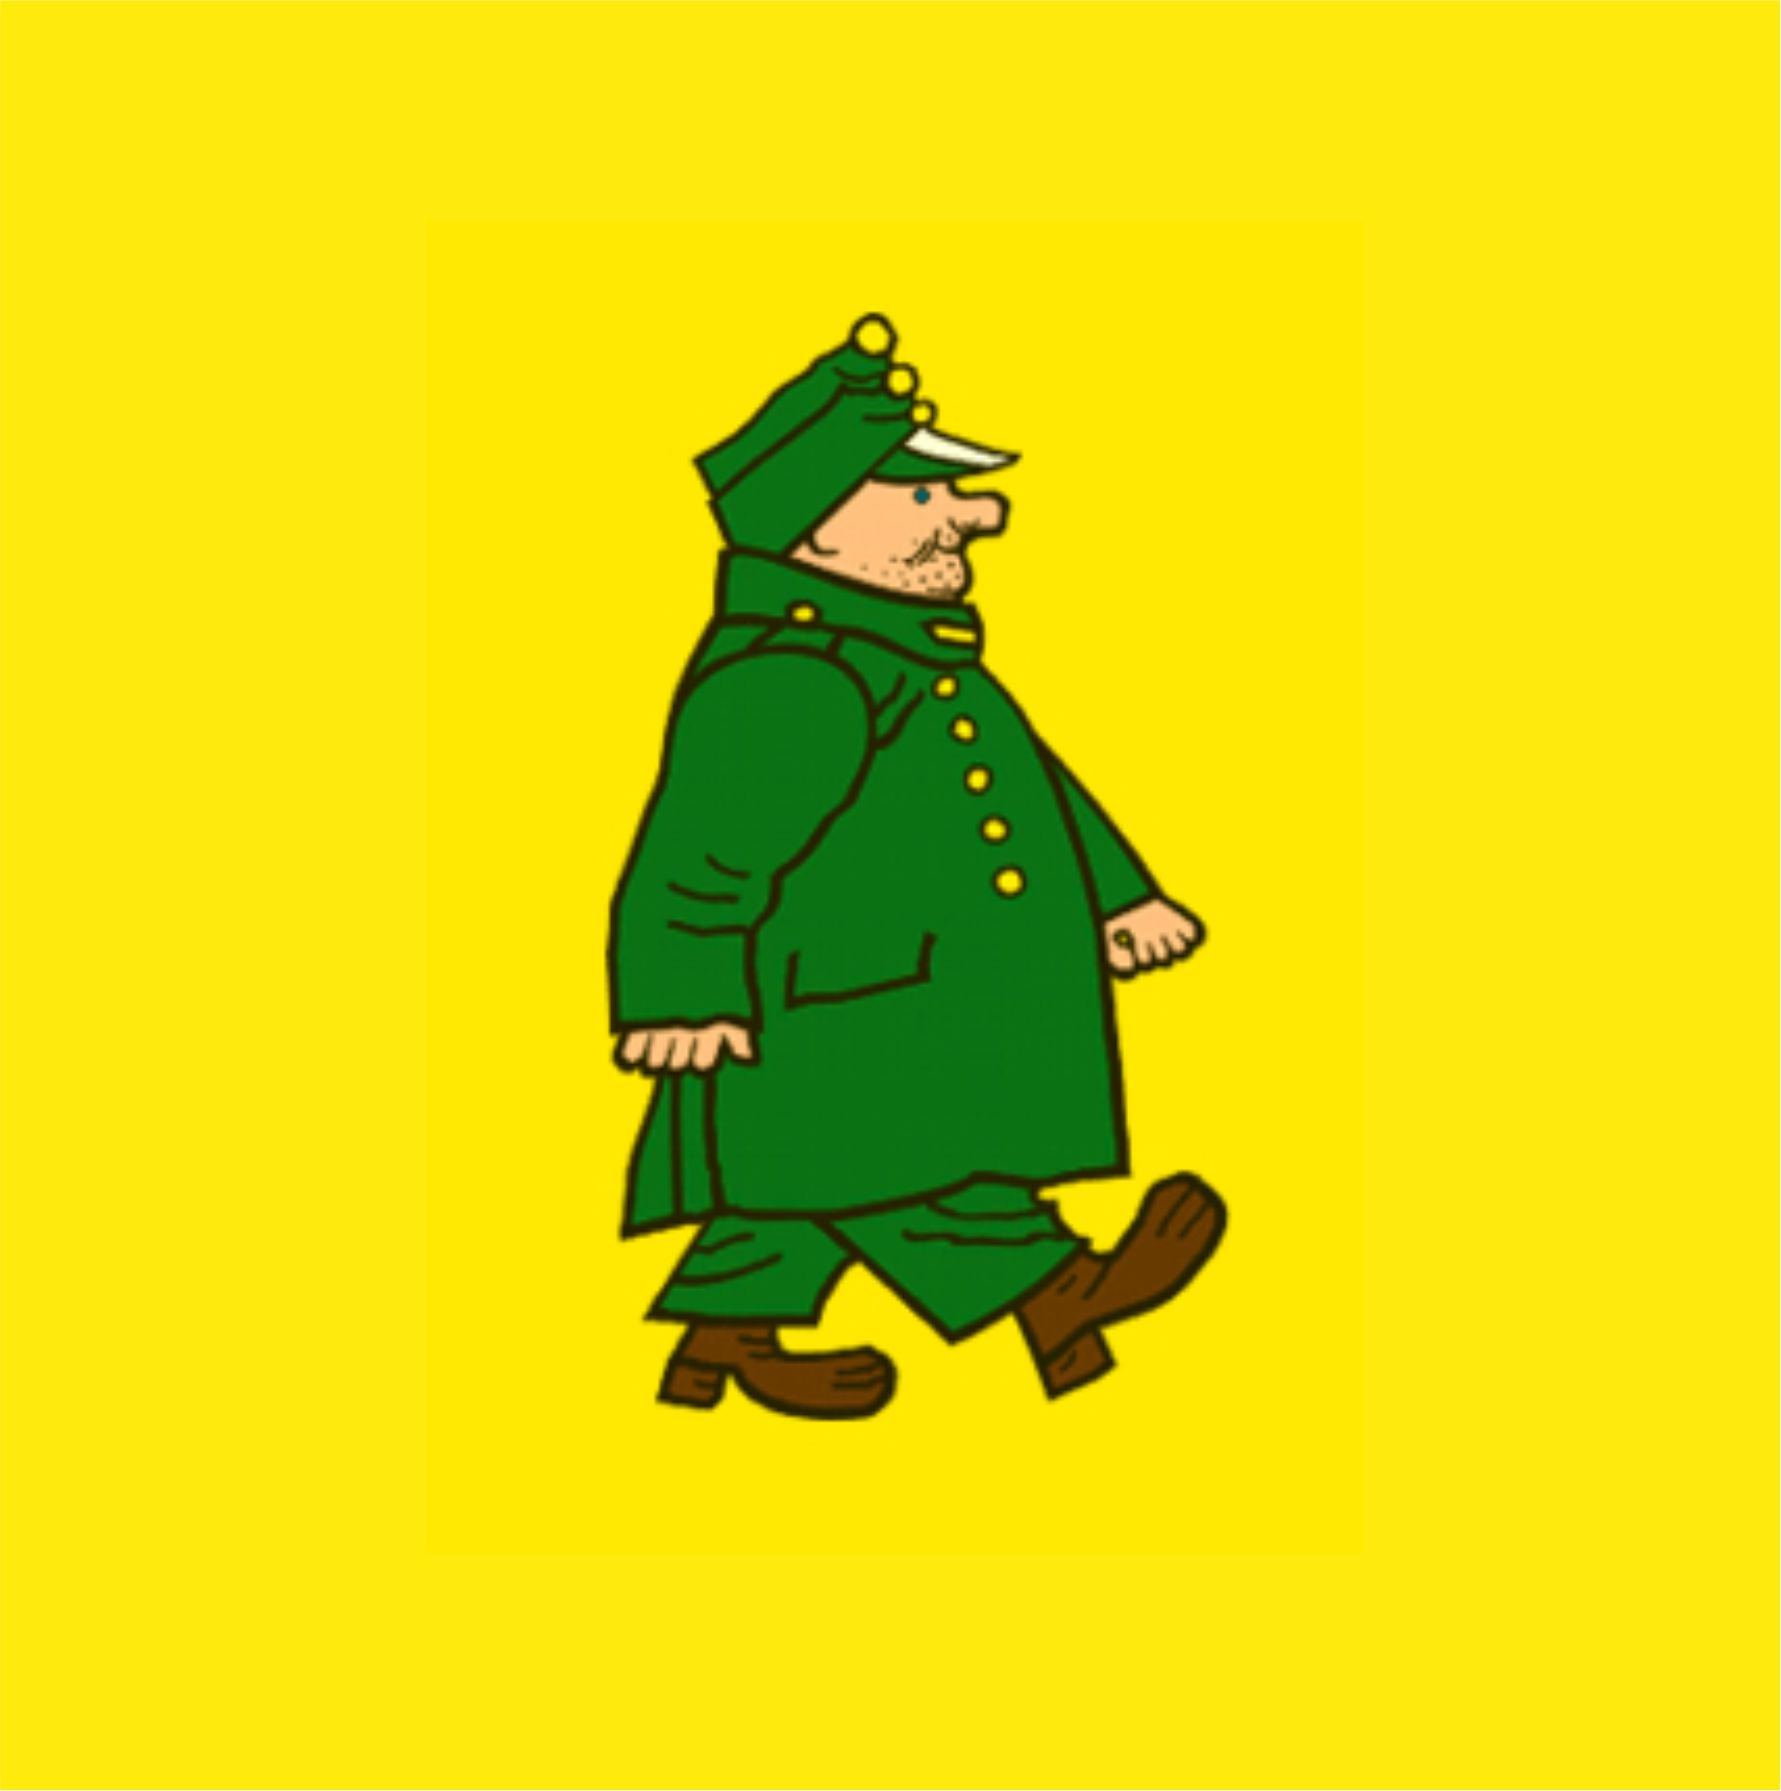 подходит картинка бравого солдата швейка своннел известен как